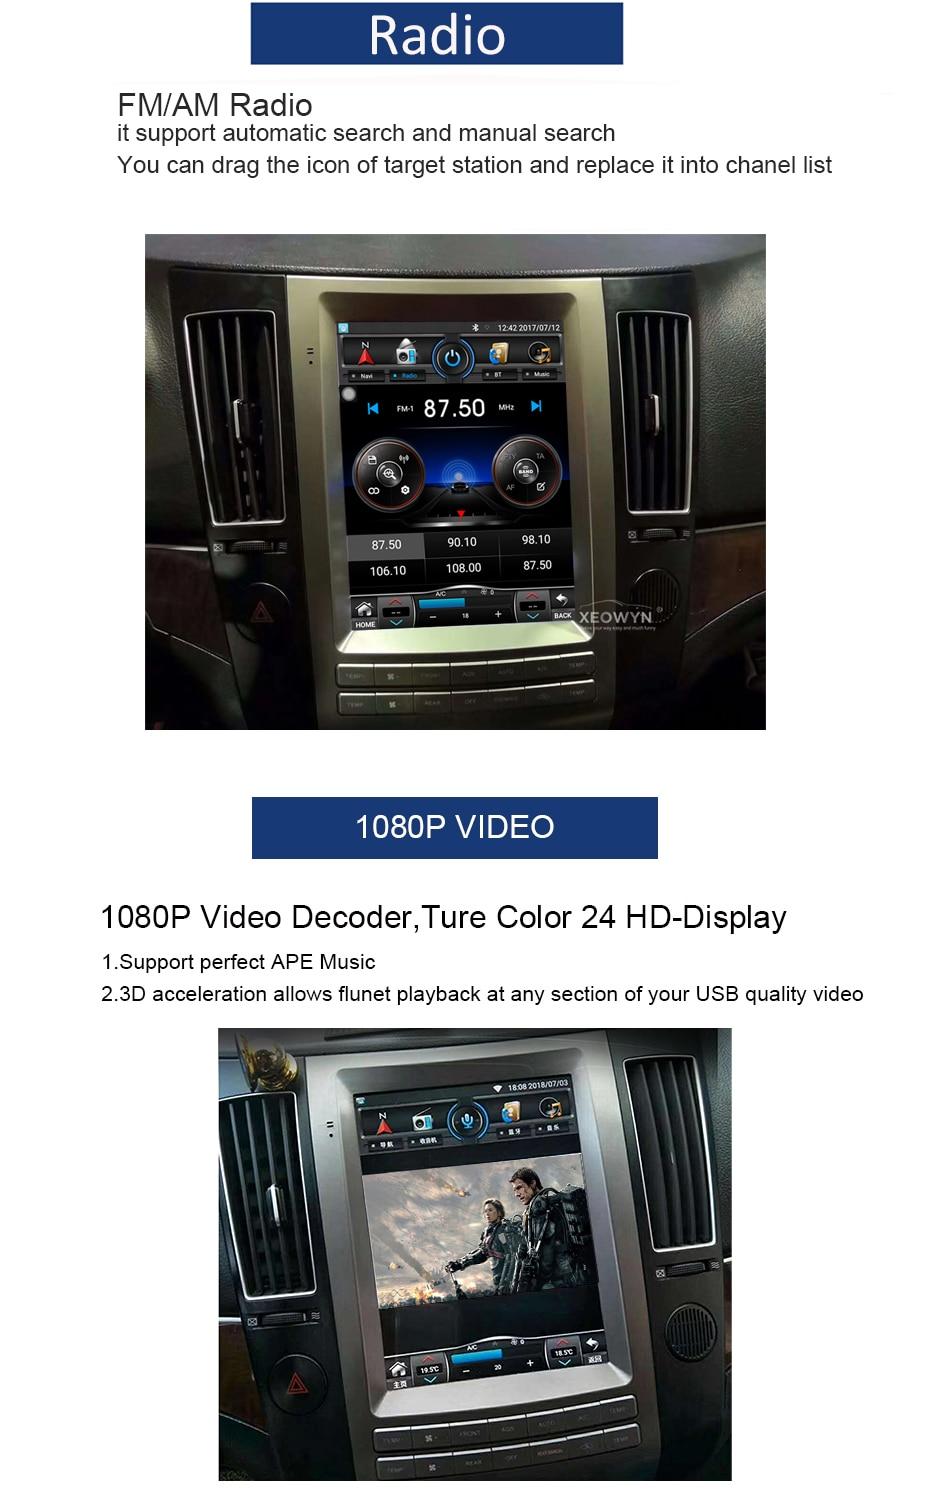 3-Radio and video